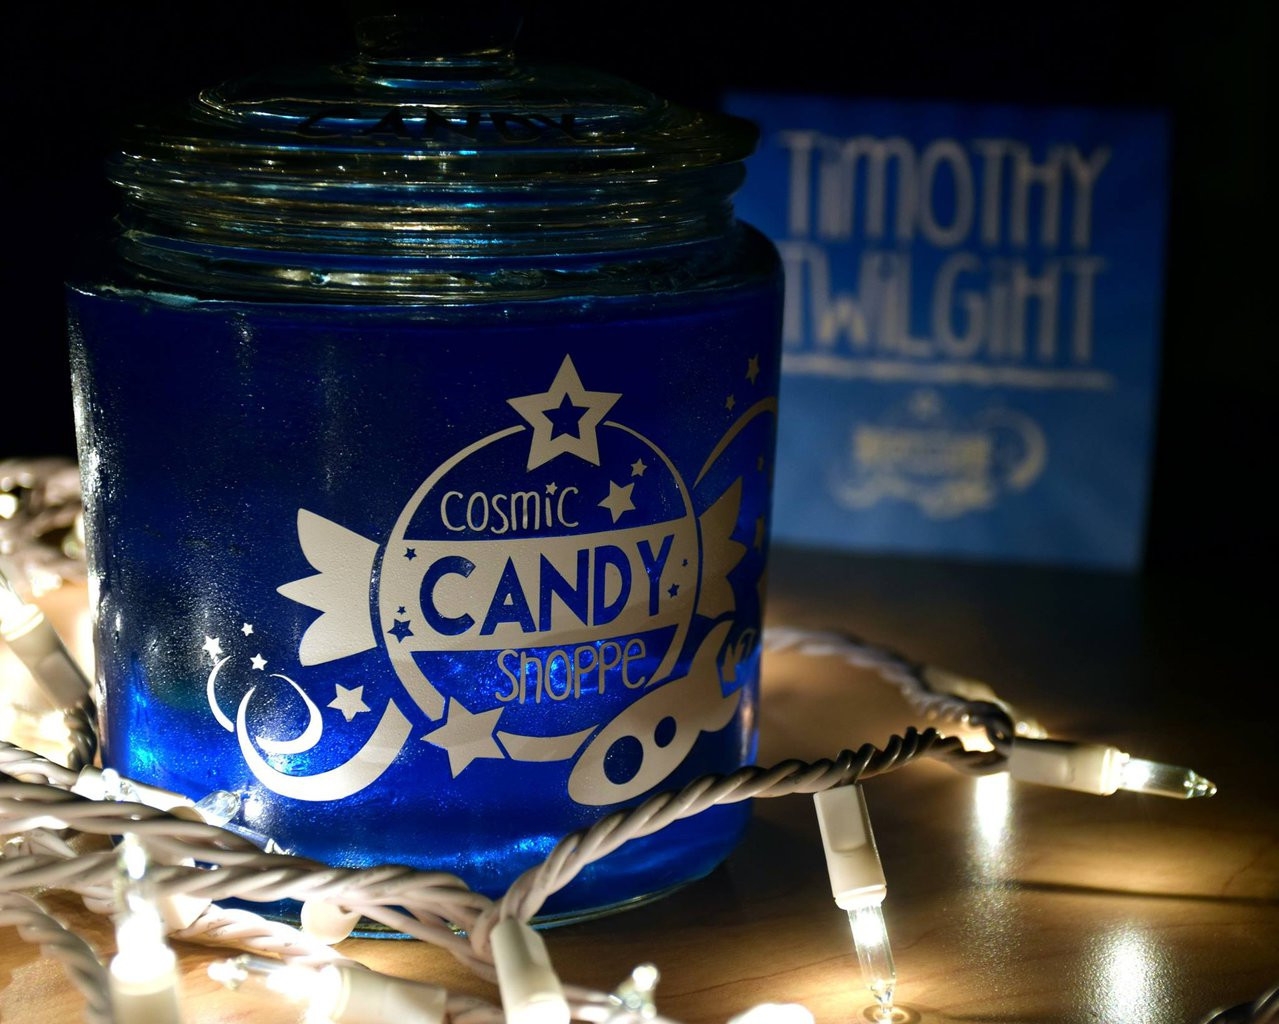 Cosmic Candy Shoppe Vinyl Product Shoot